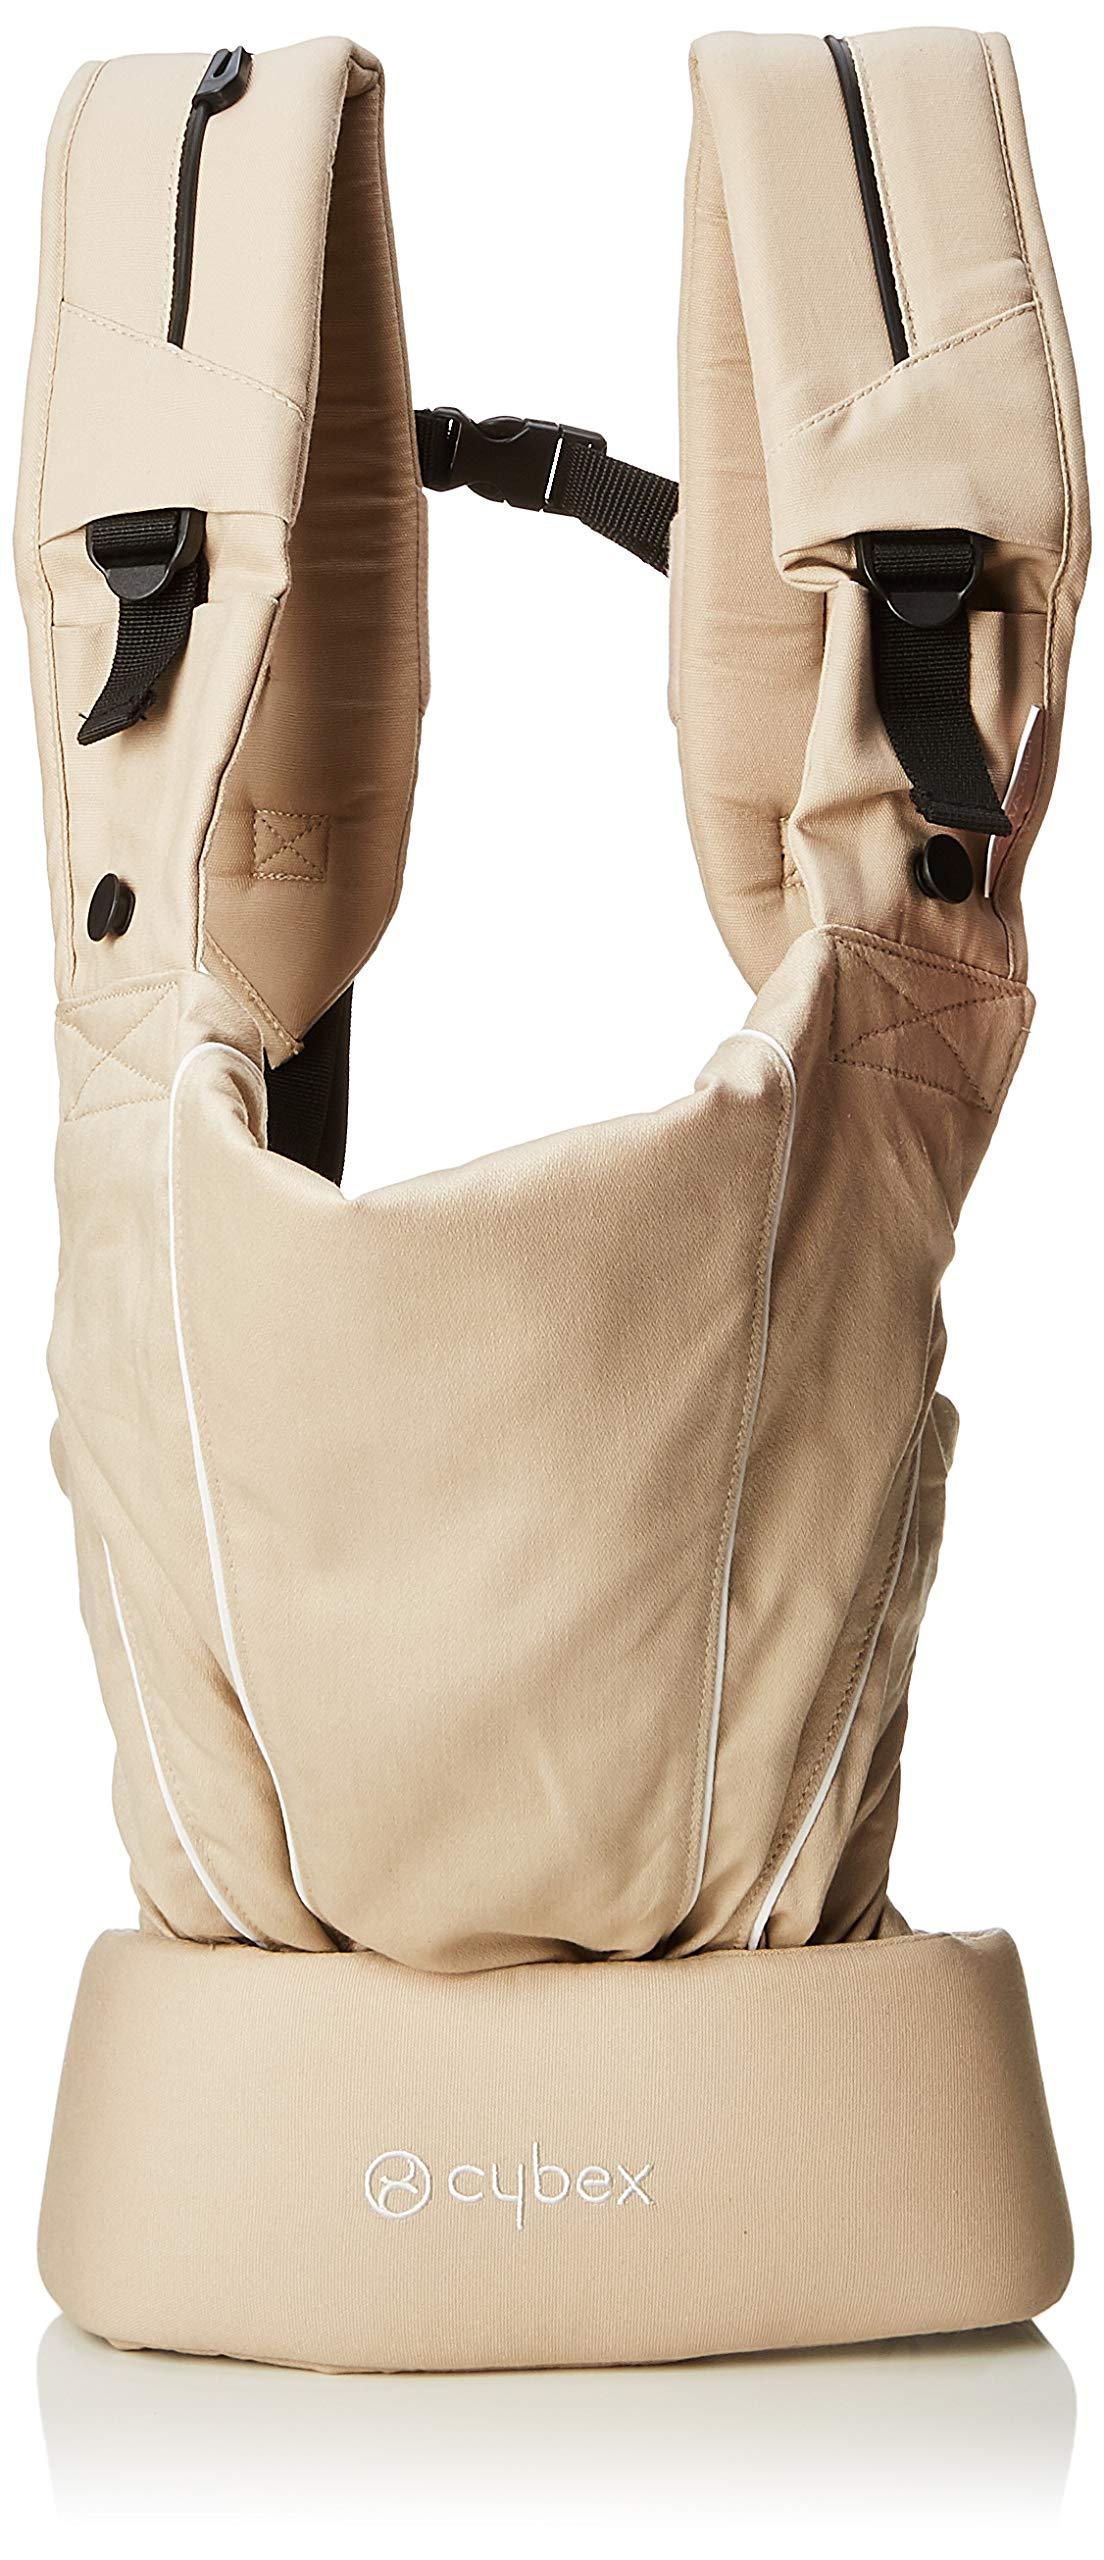 cybex Gold Maira Click Baby Carrier, Cashmere Beige